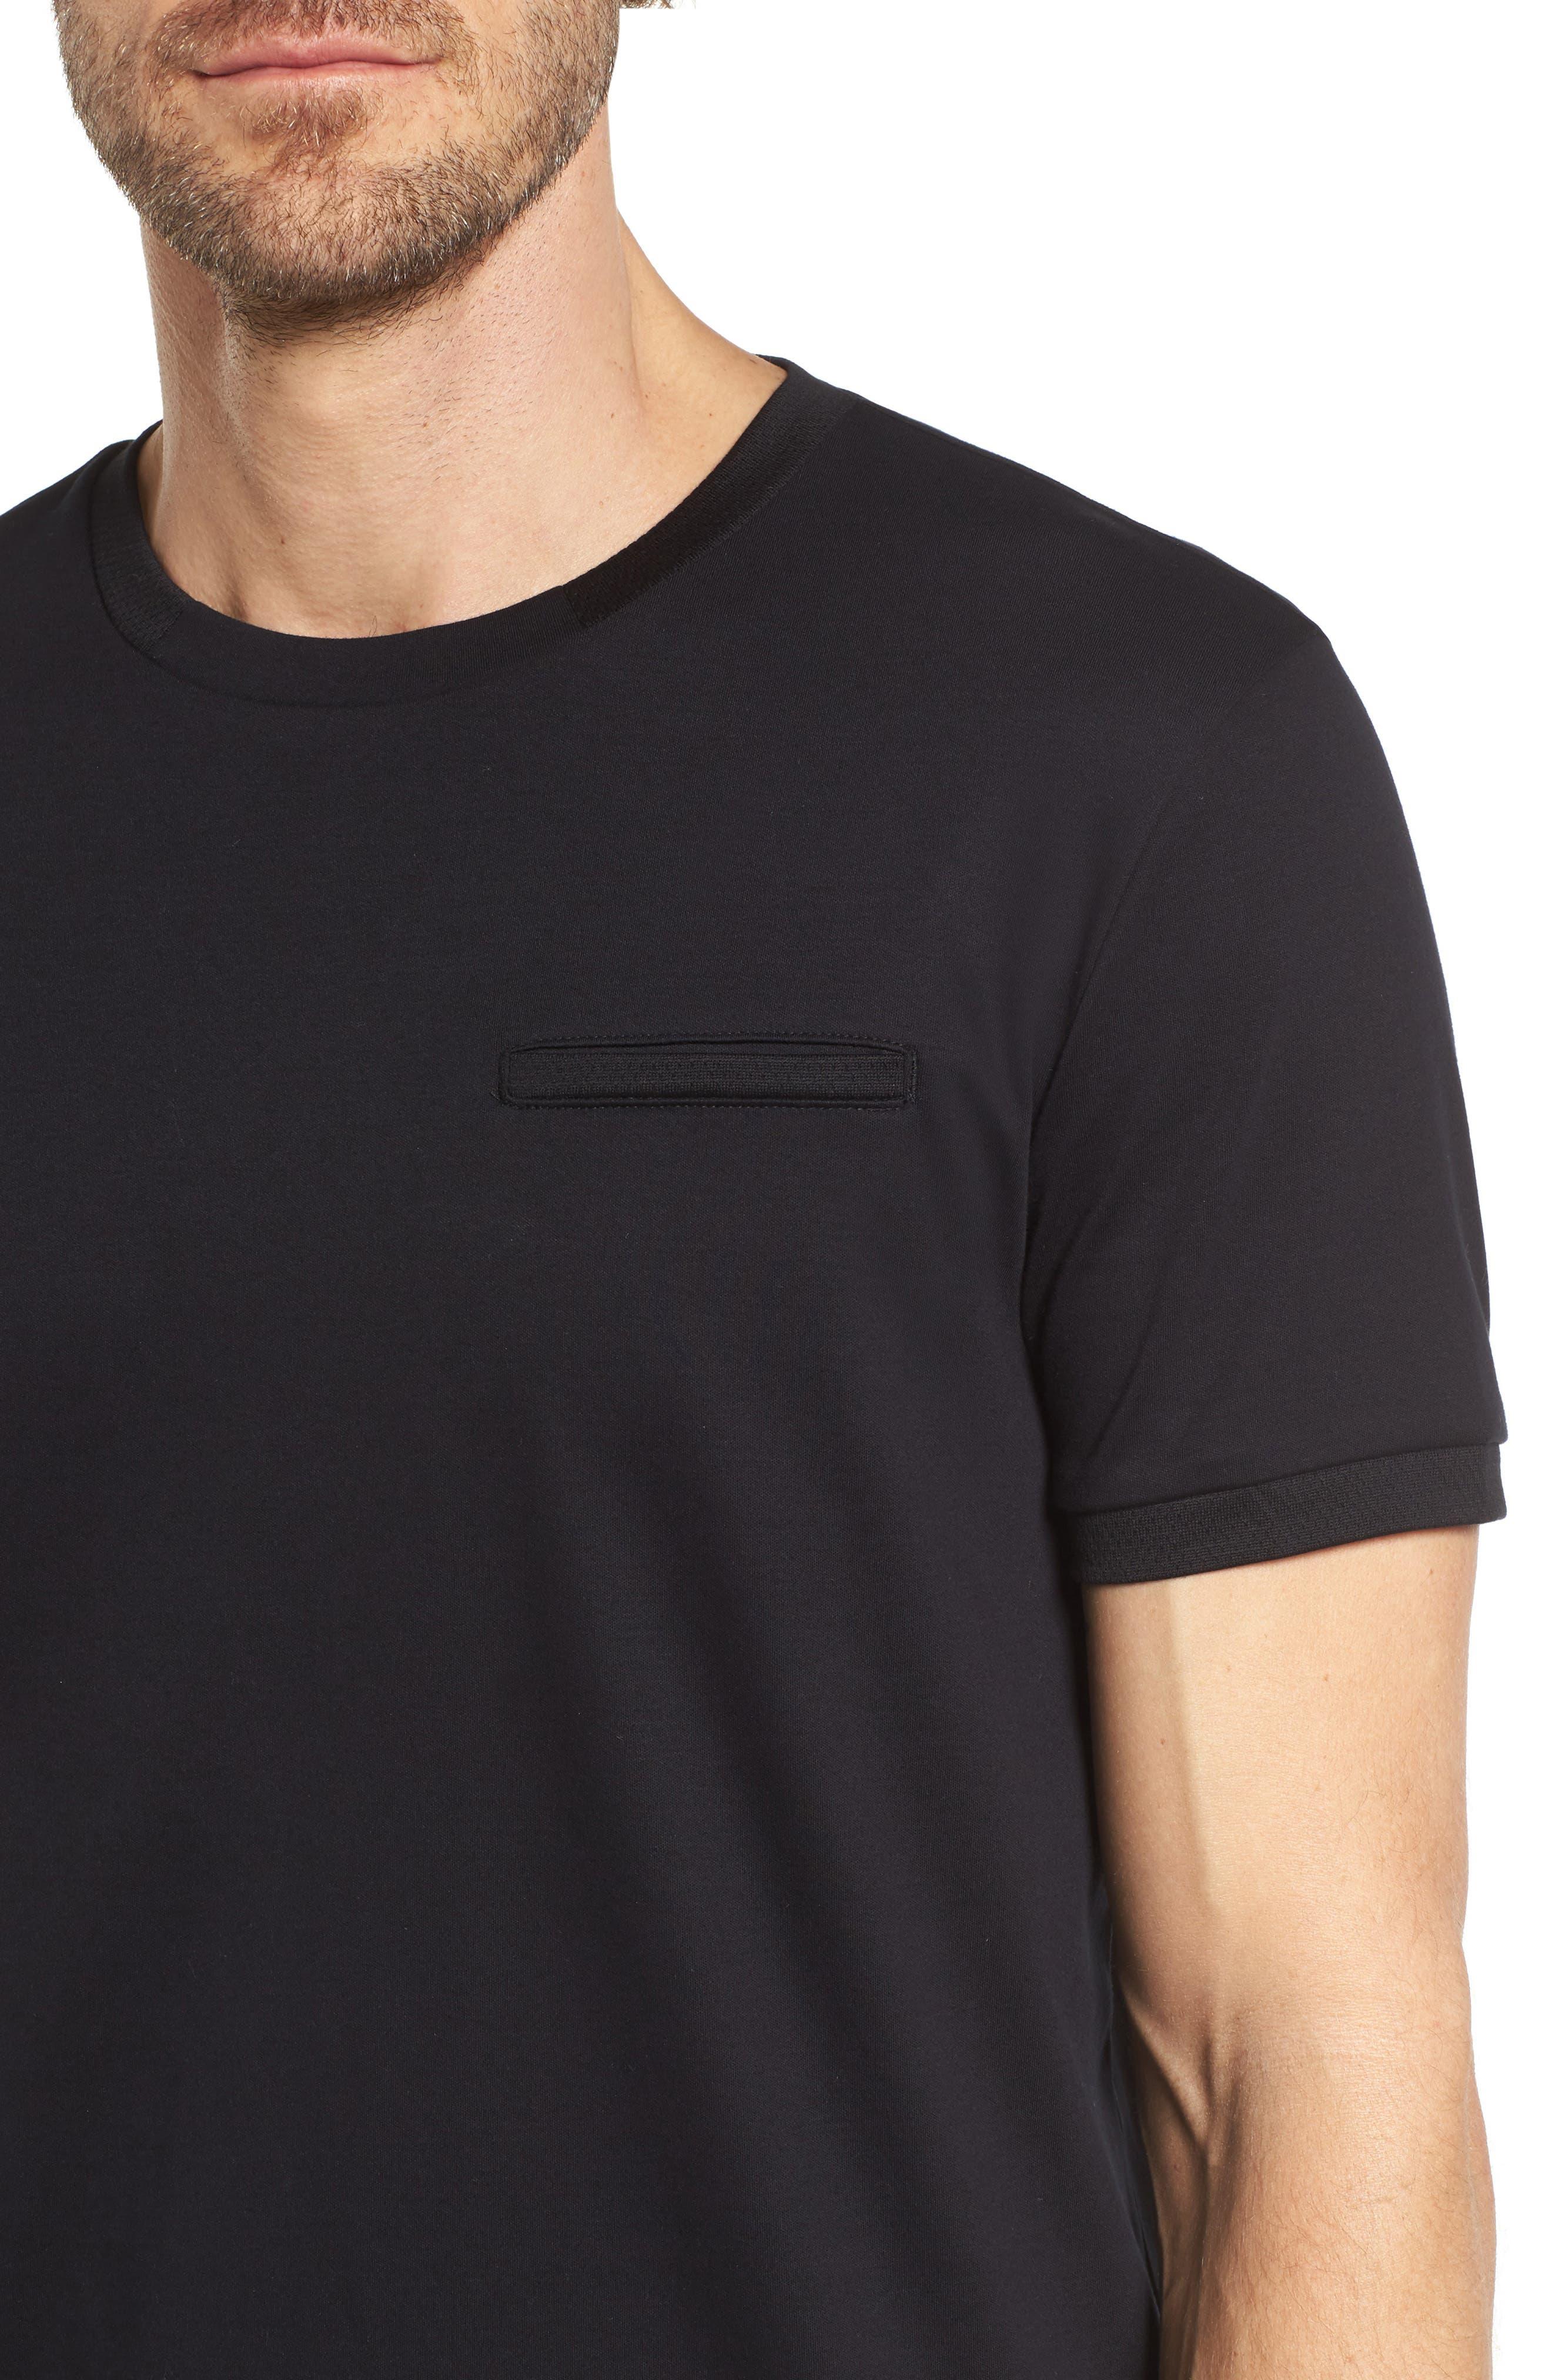 Tessler Mercedes Slim Fit Crewneck T-Shirt,                             Alternate thumbnail 4, color,                             Black